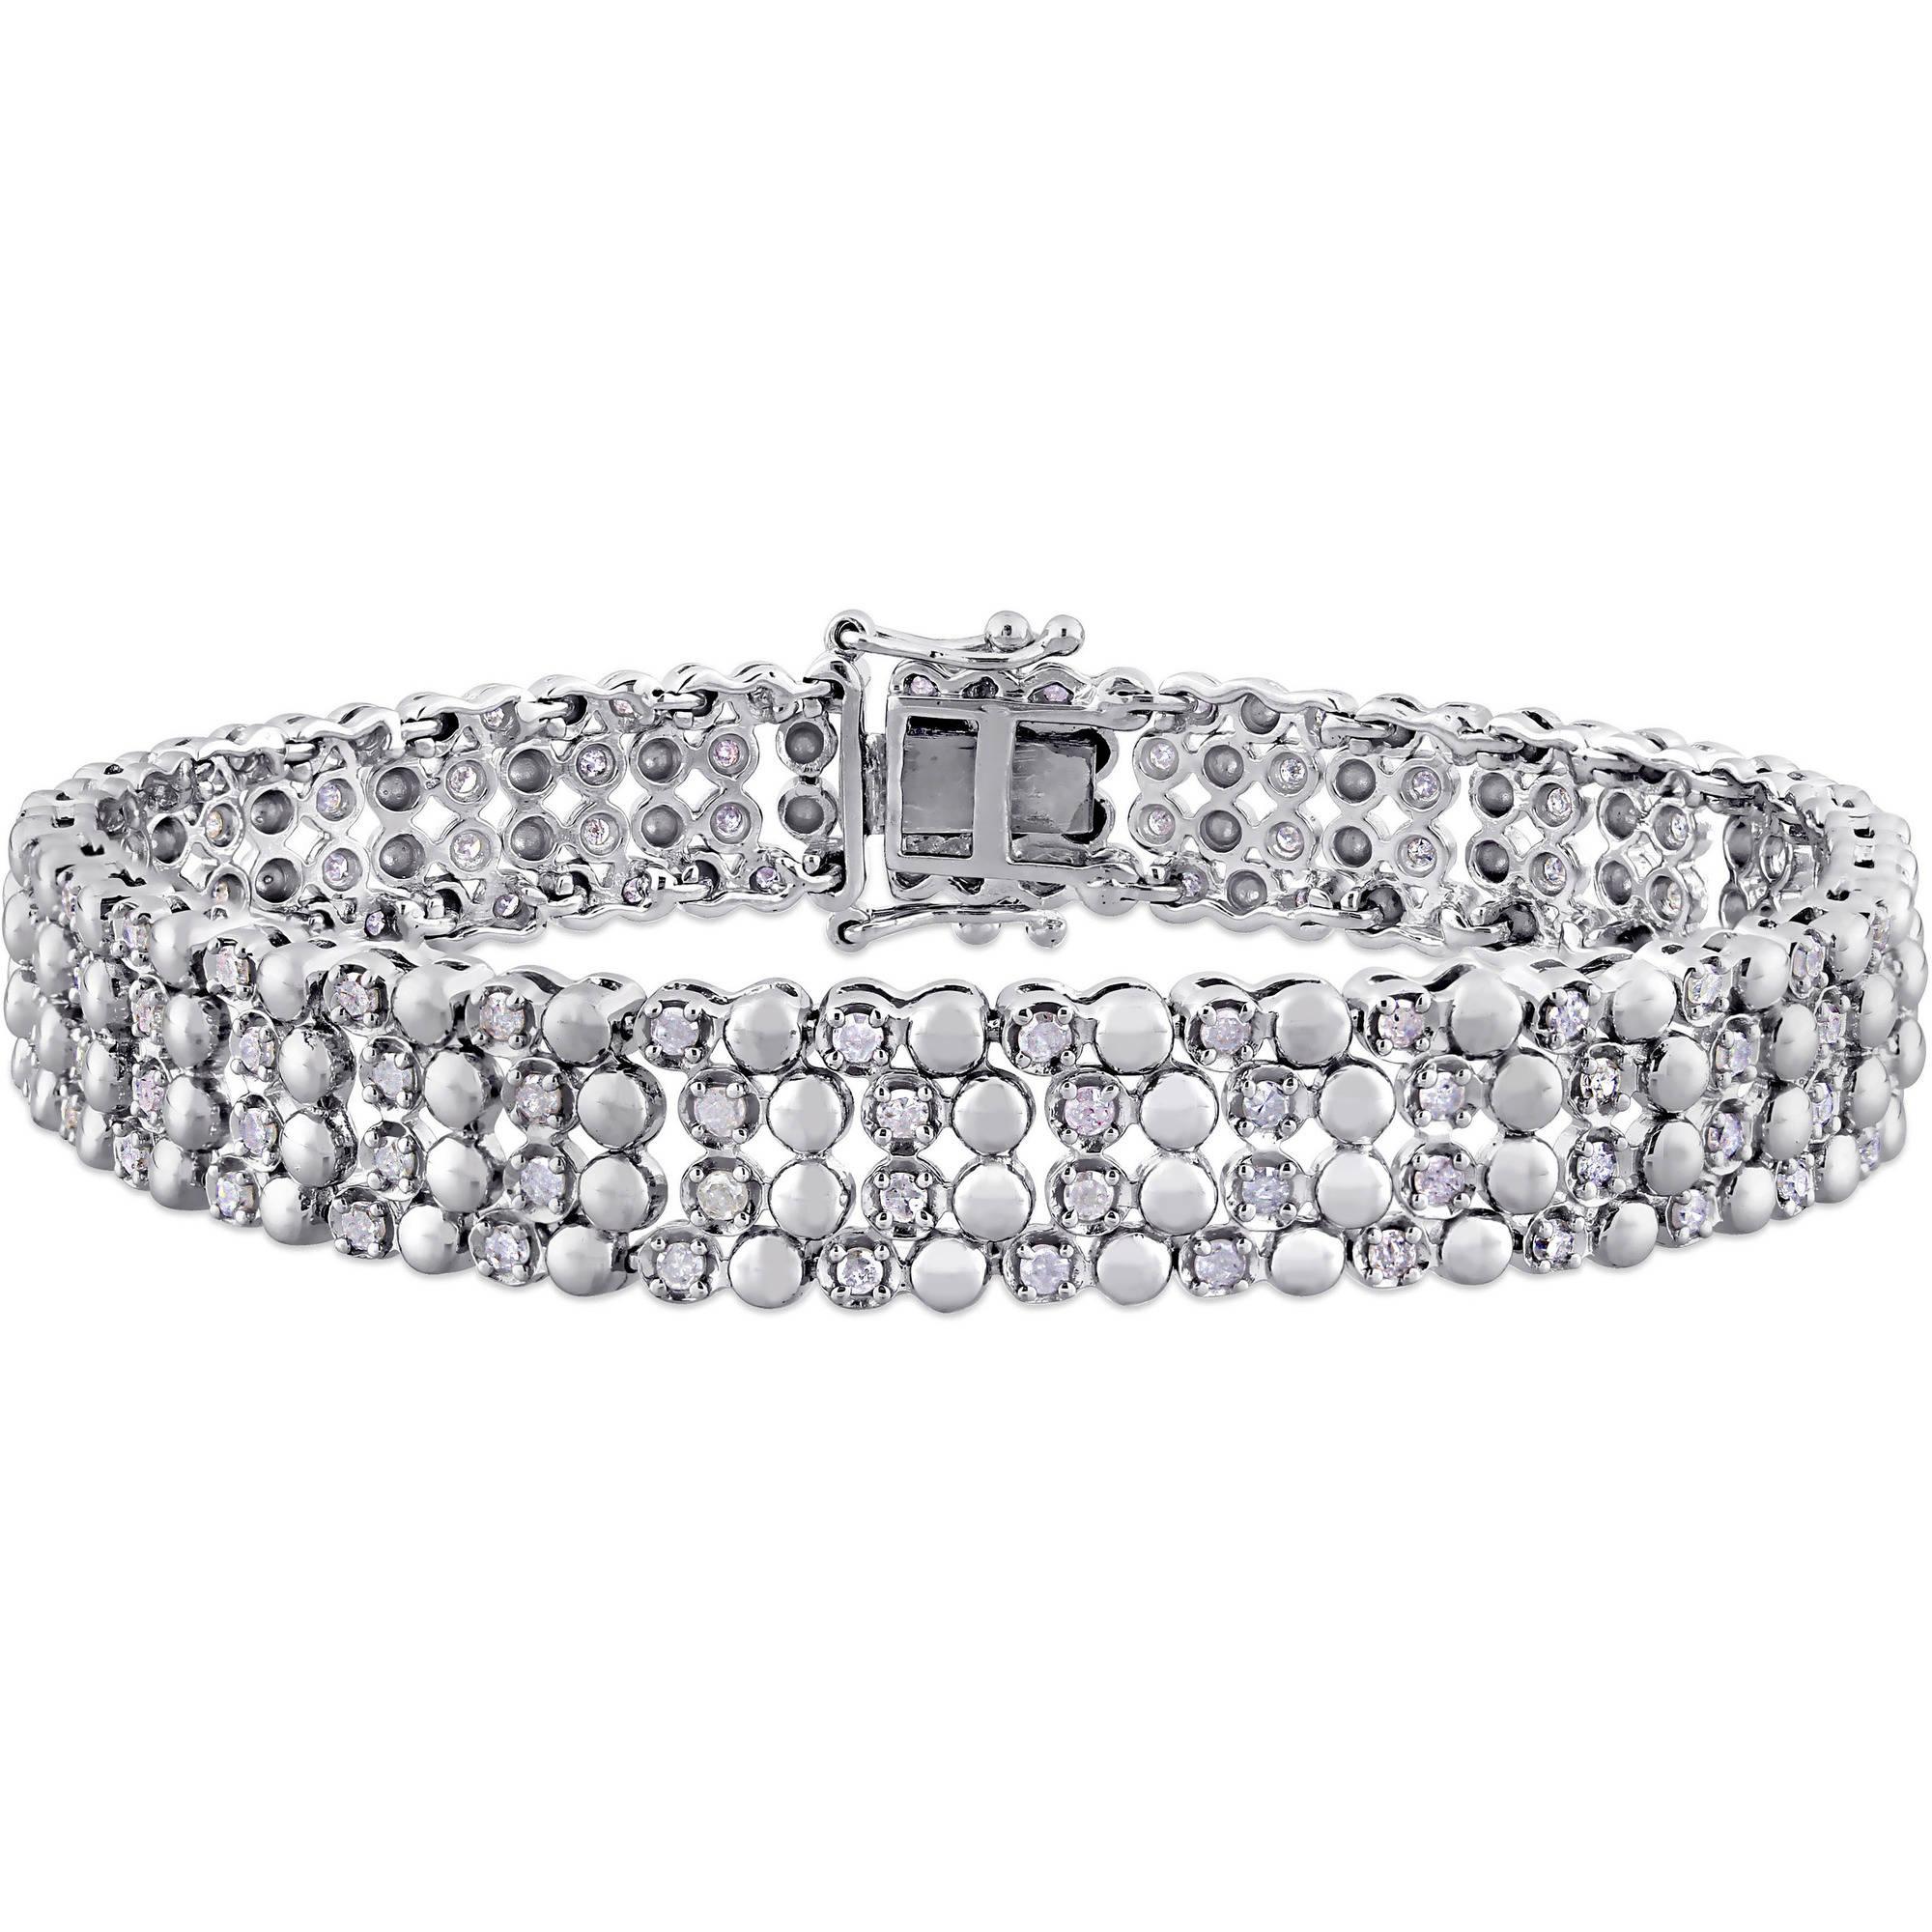 "Miabella 2 Carat T.W. Diamond Sterling Silver Four-Row Tennis Bracelet, 7"" by Generic"